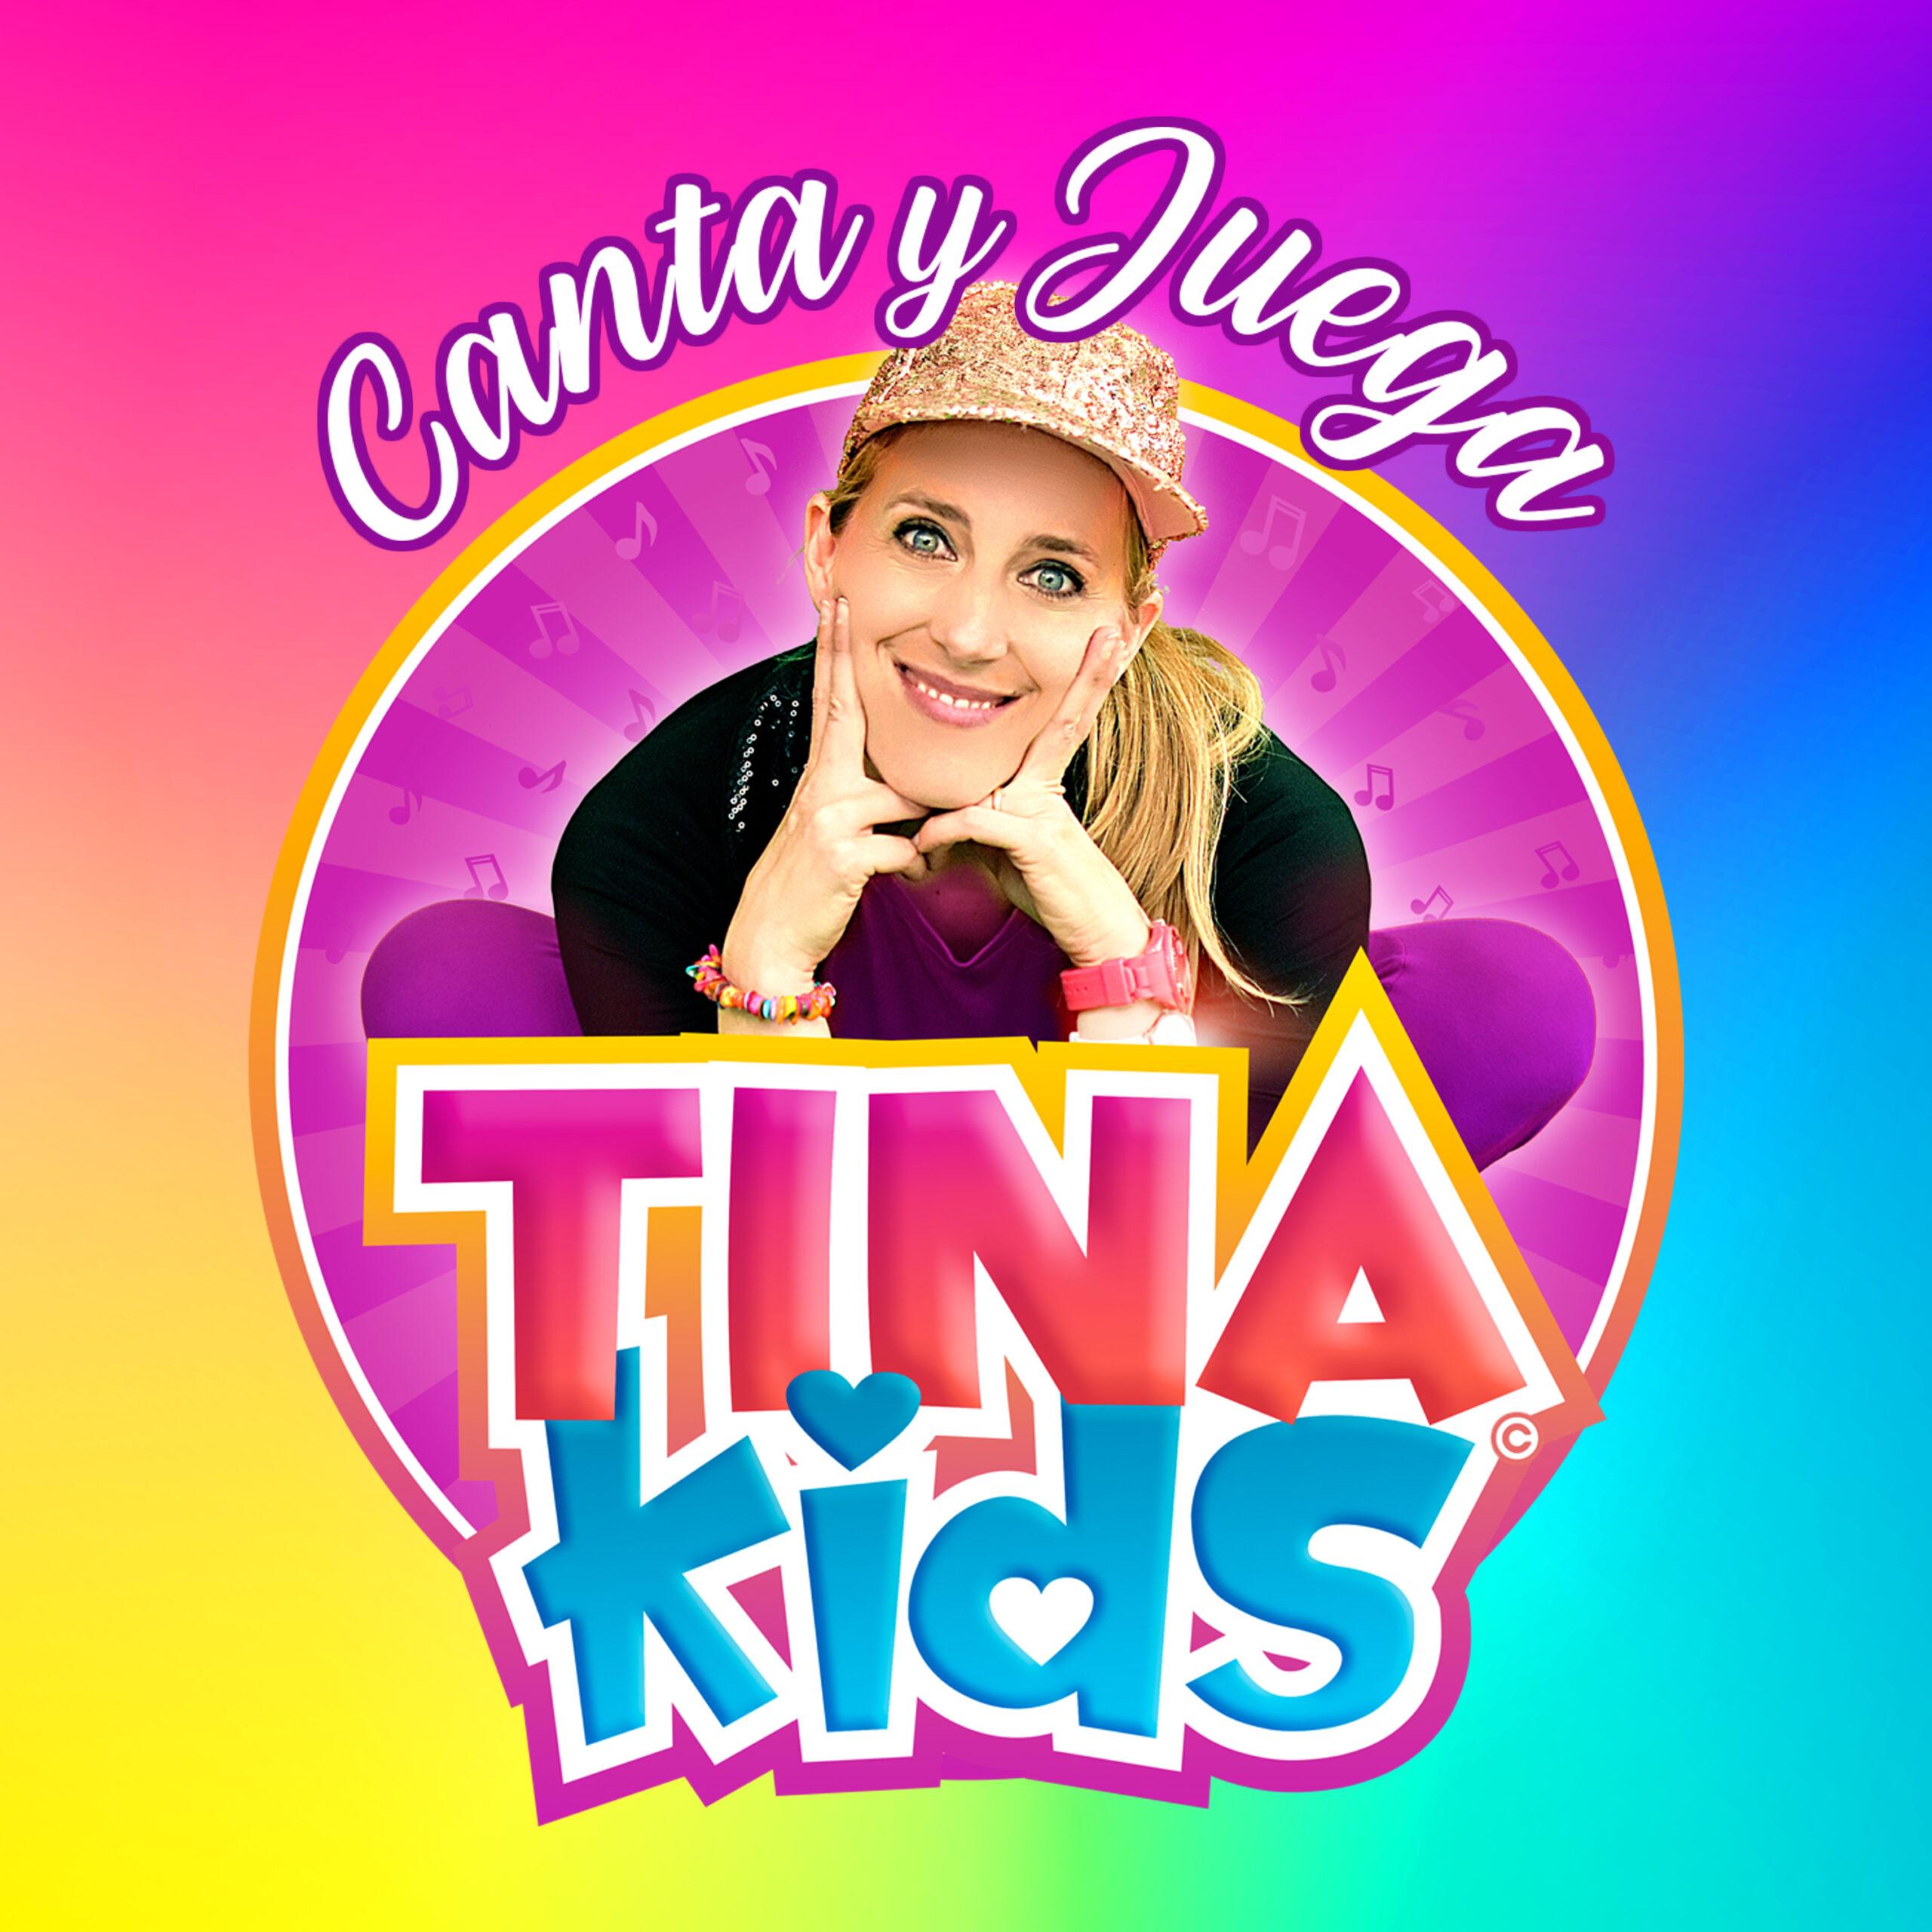 Kids wedding entertainer Spain, Tina Kids winner of Latin grammy award.